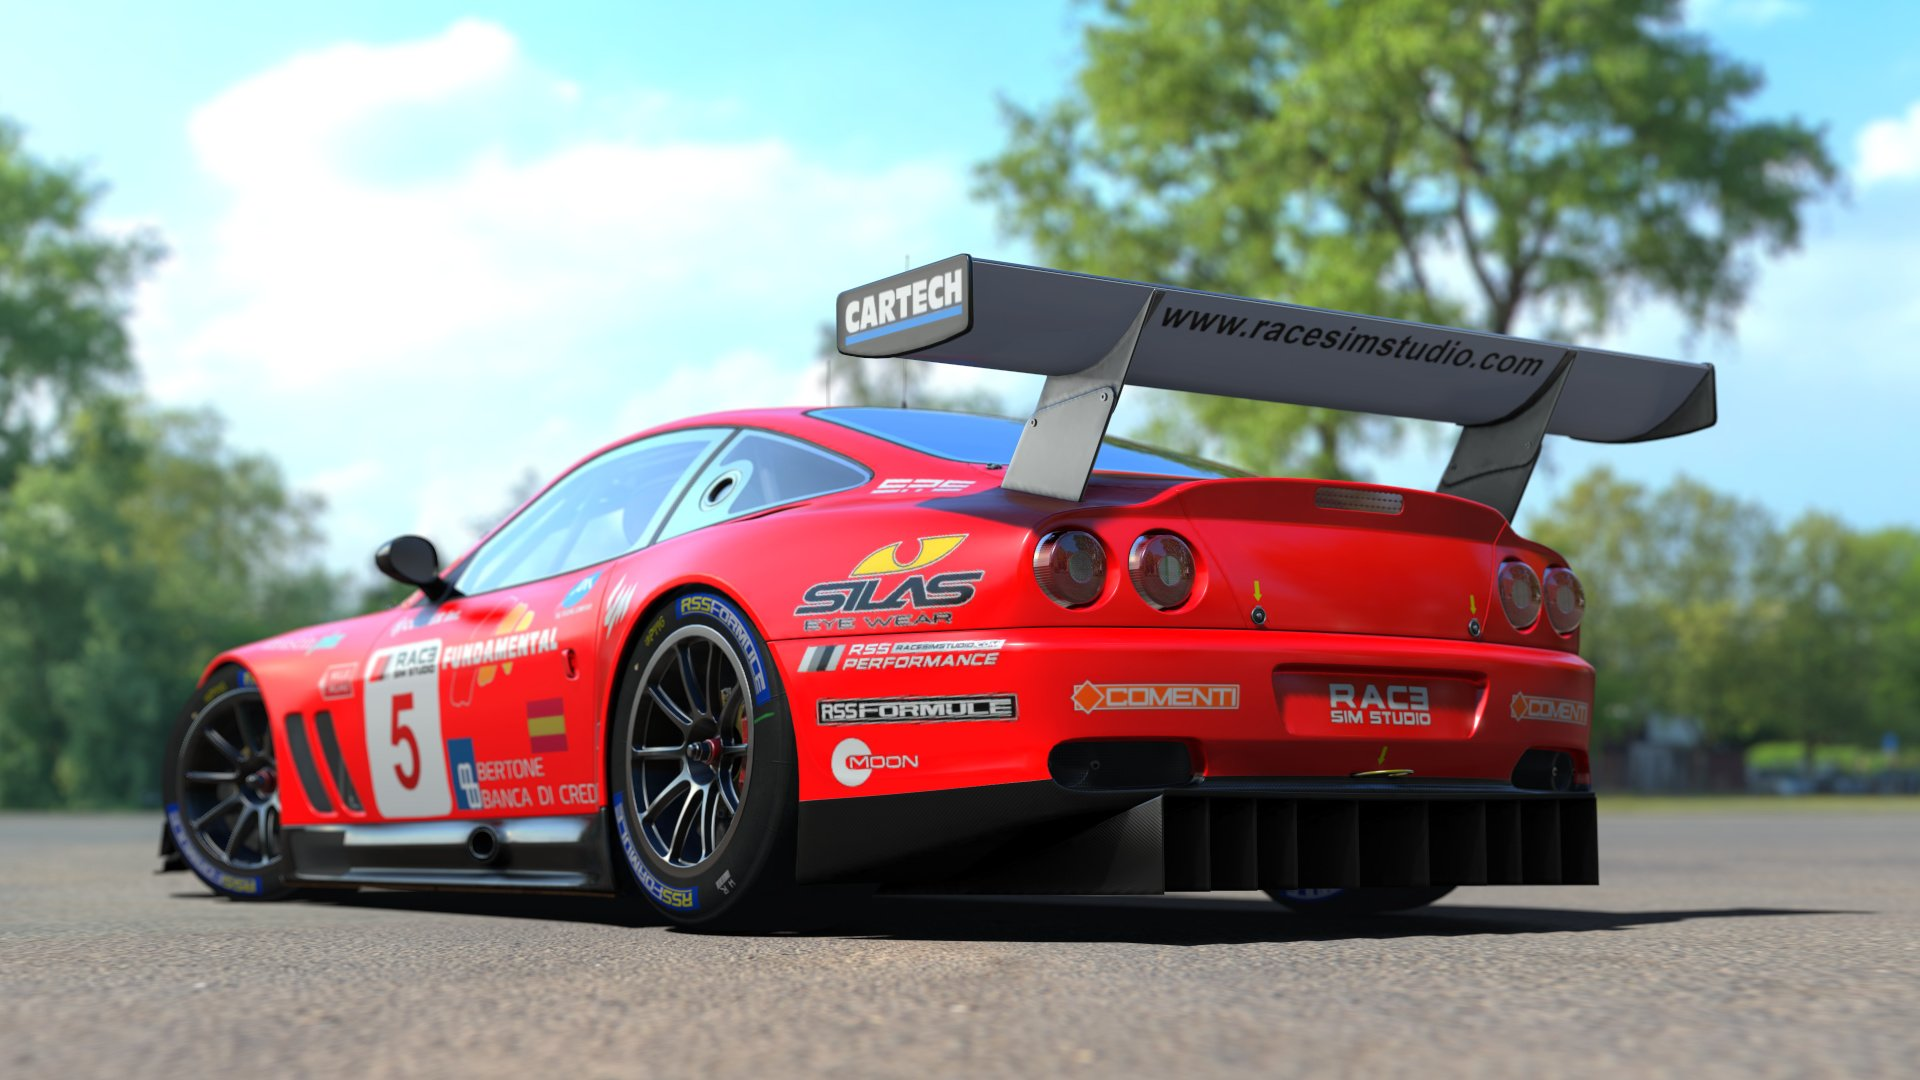 Race Sim Studio GT Pack part 1 Ferruccio 550 v12 2